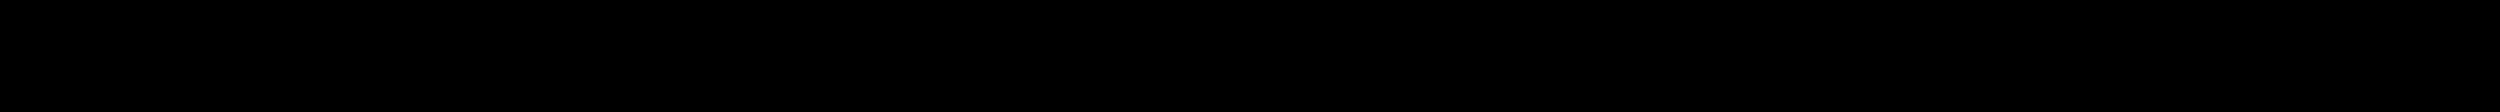 line3.png